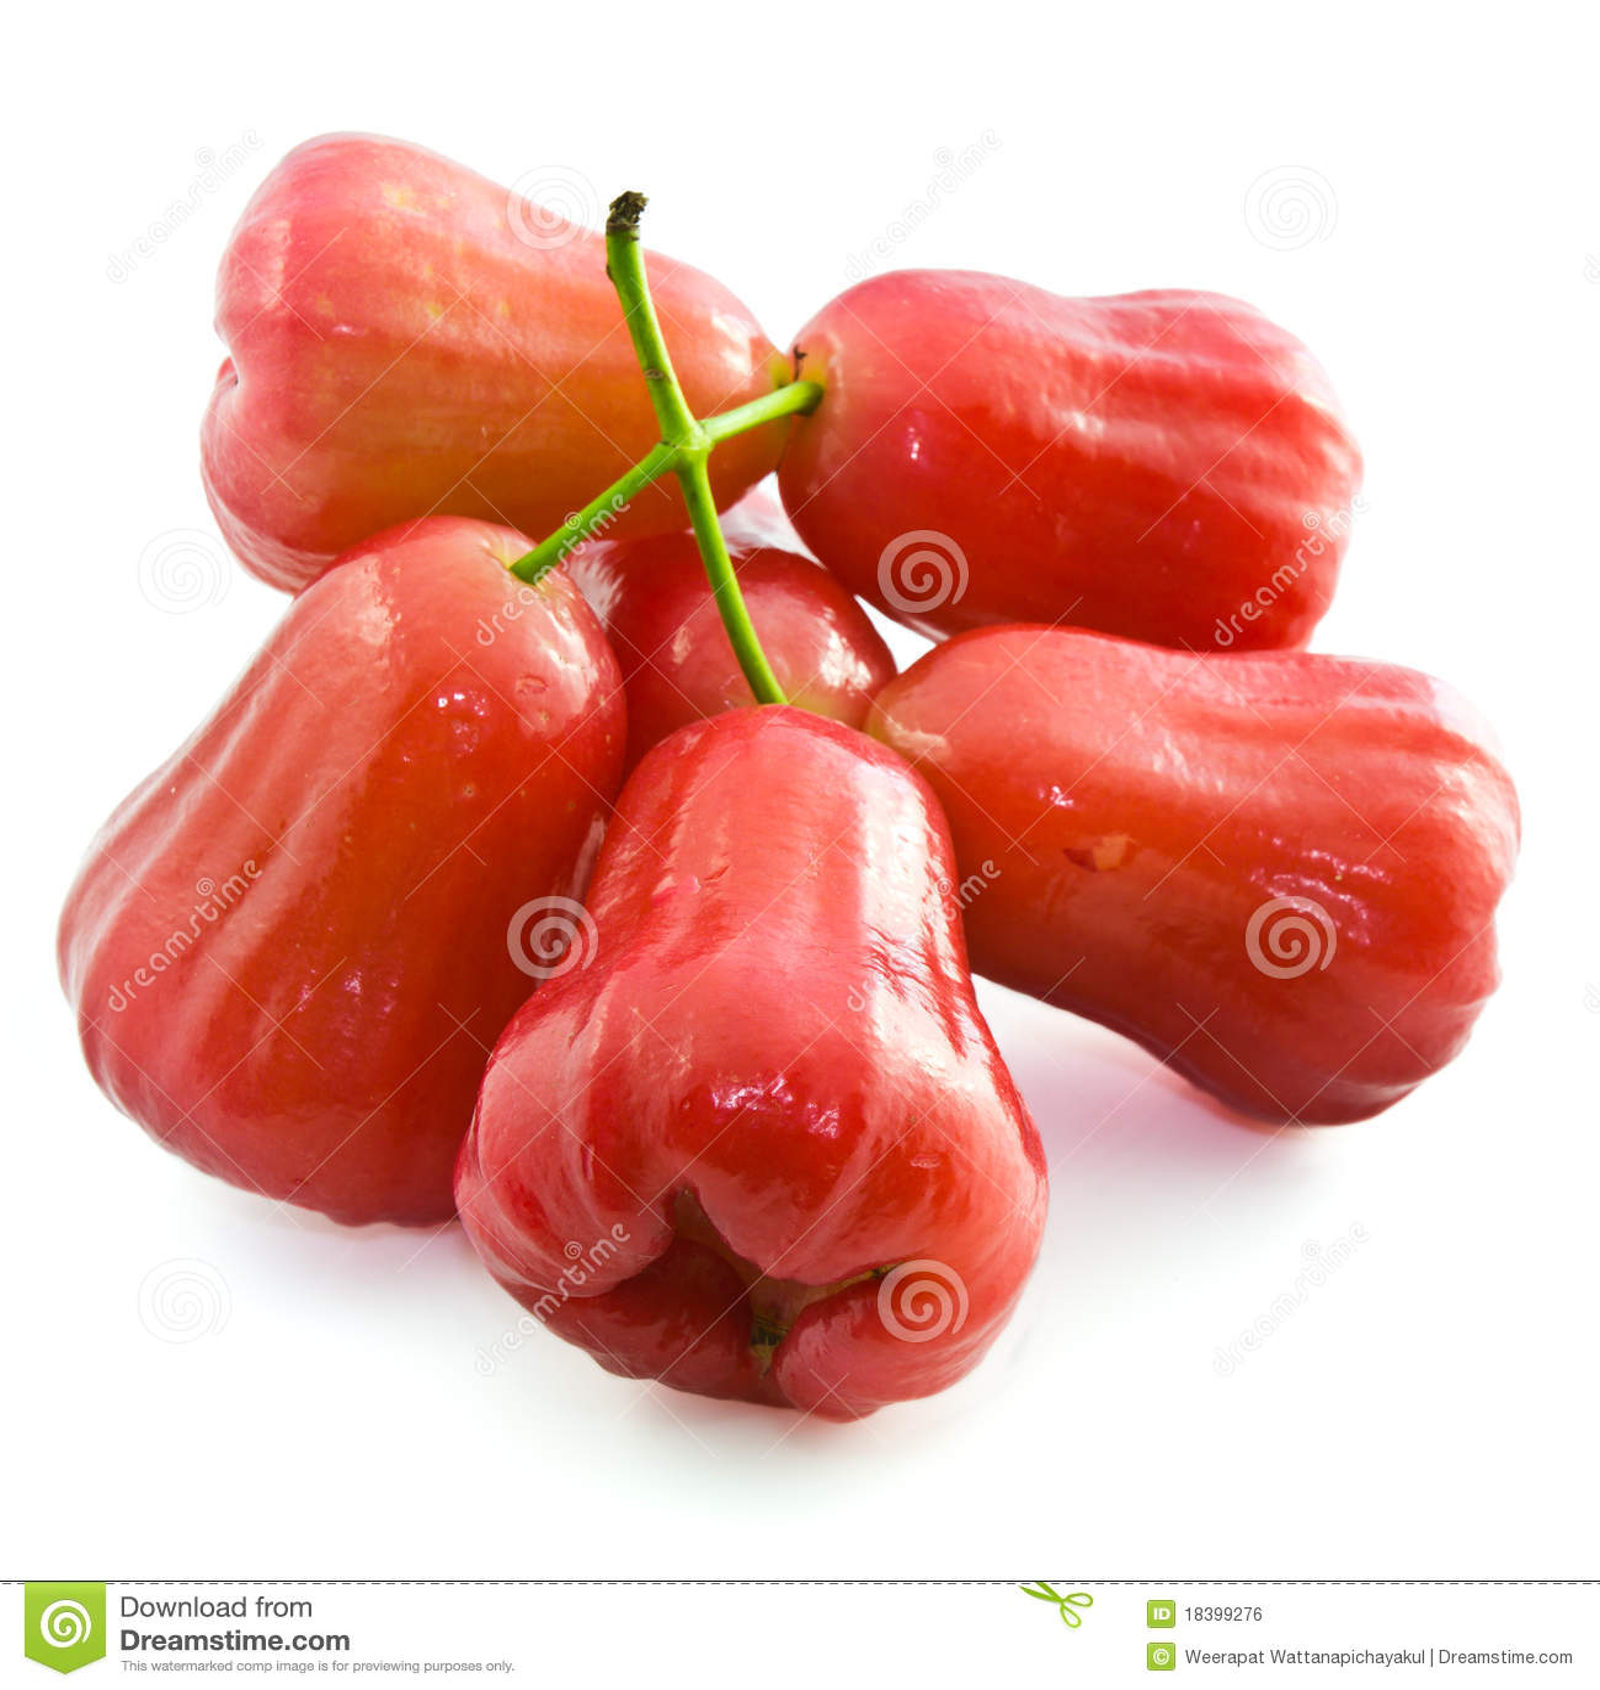 Rose Apple Royalty Free Stock Image - Image: 18399276